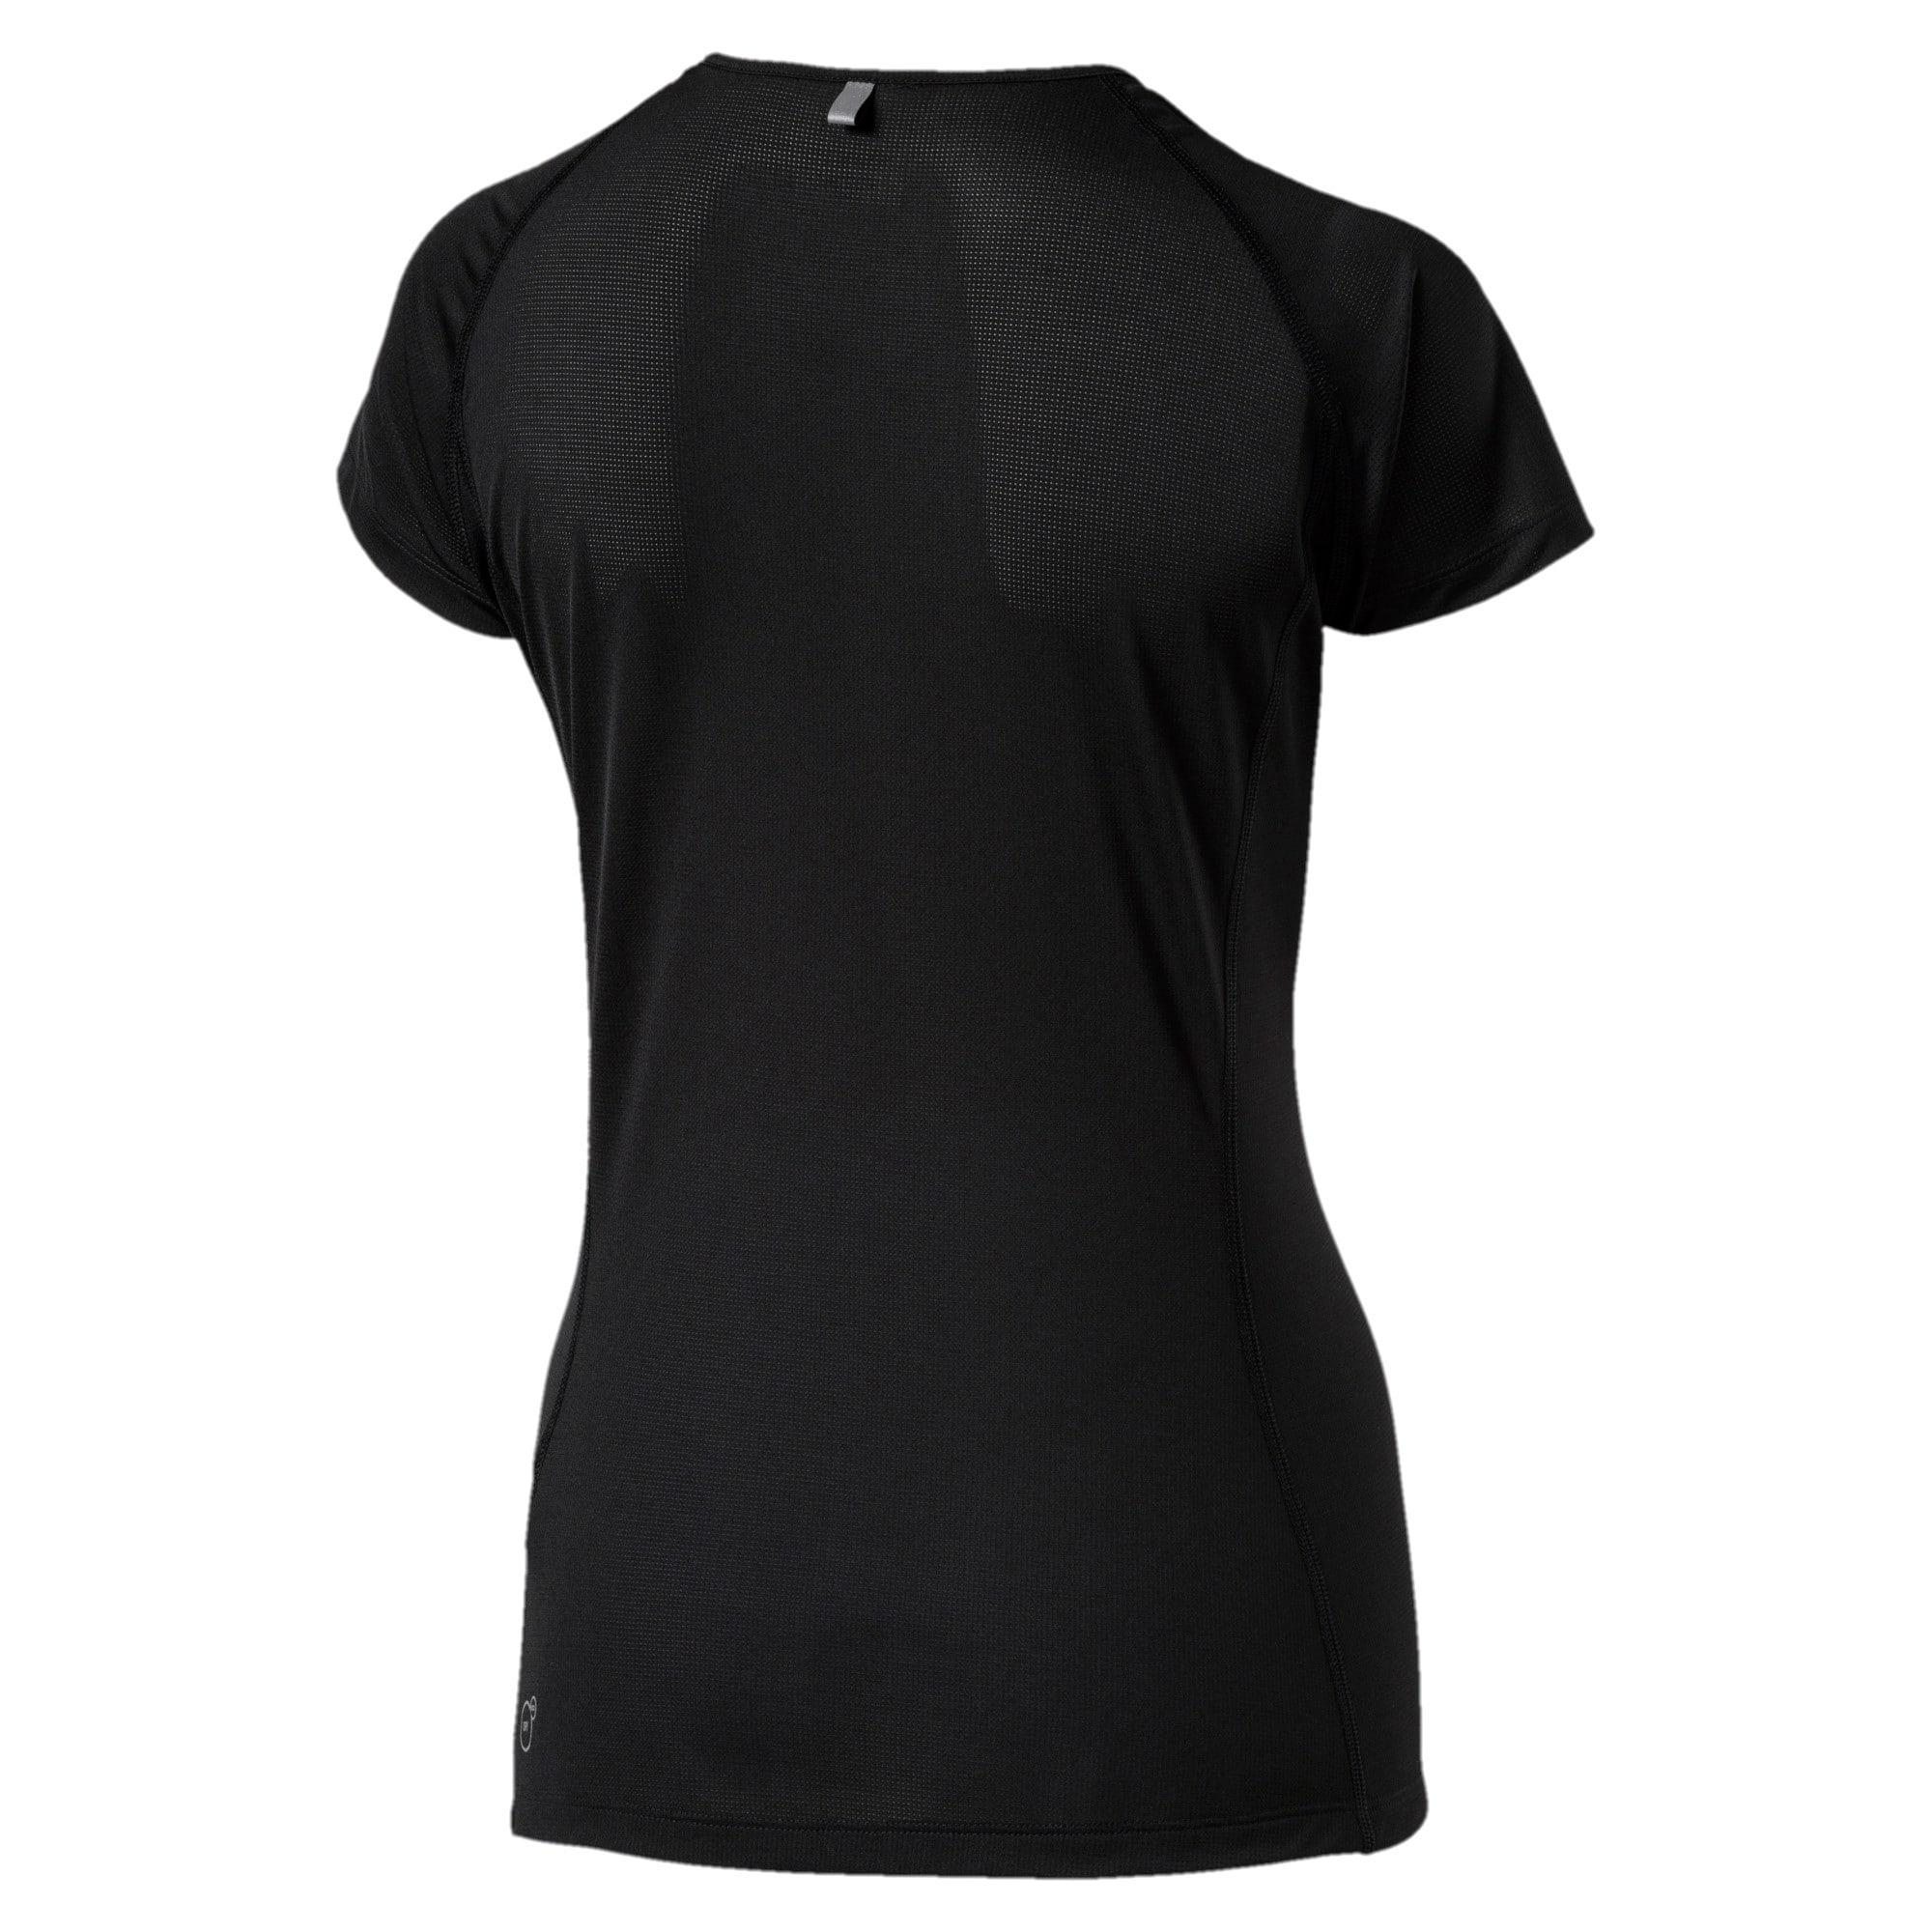 Thumbnail 2 of Core-Run Short Sleeve Women's Training Top, Puma Black, medium-IND